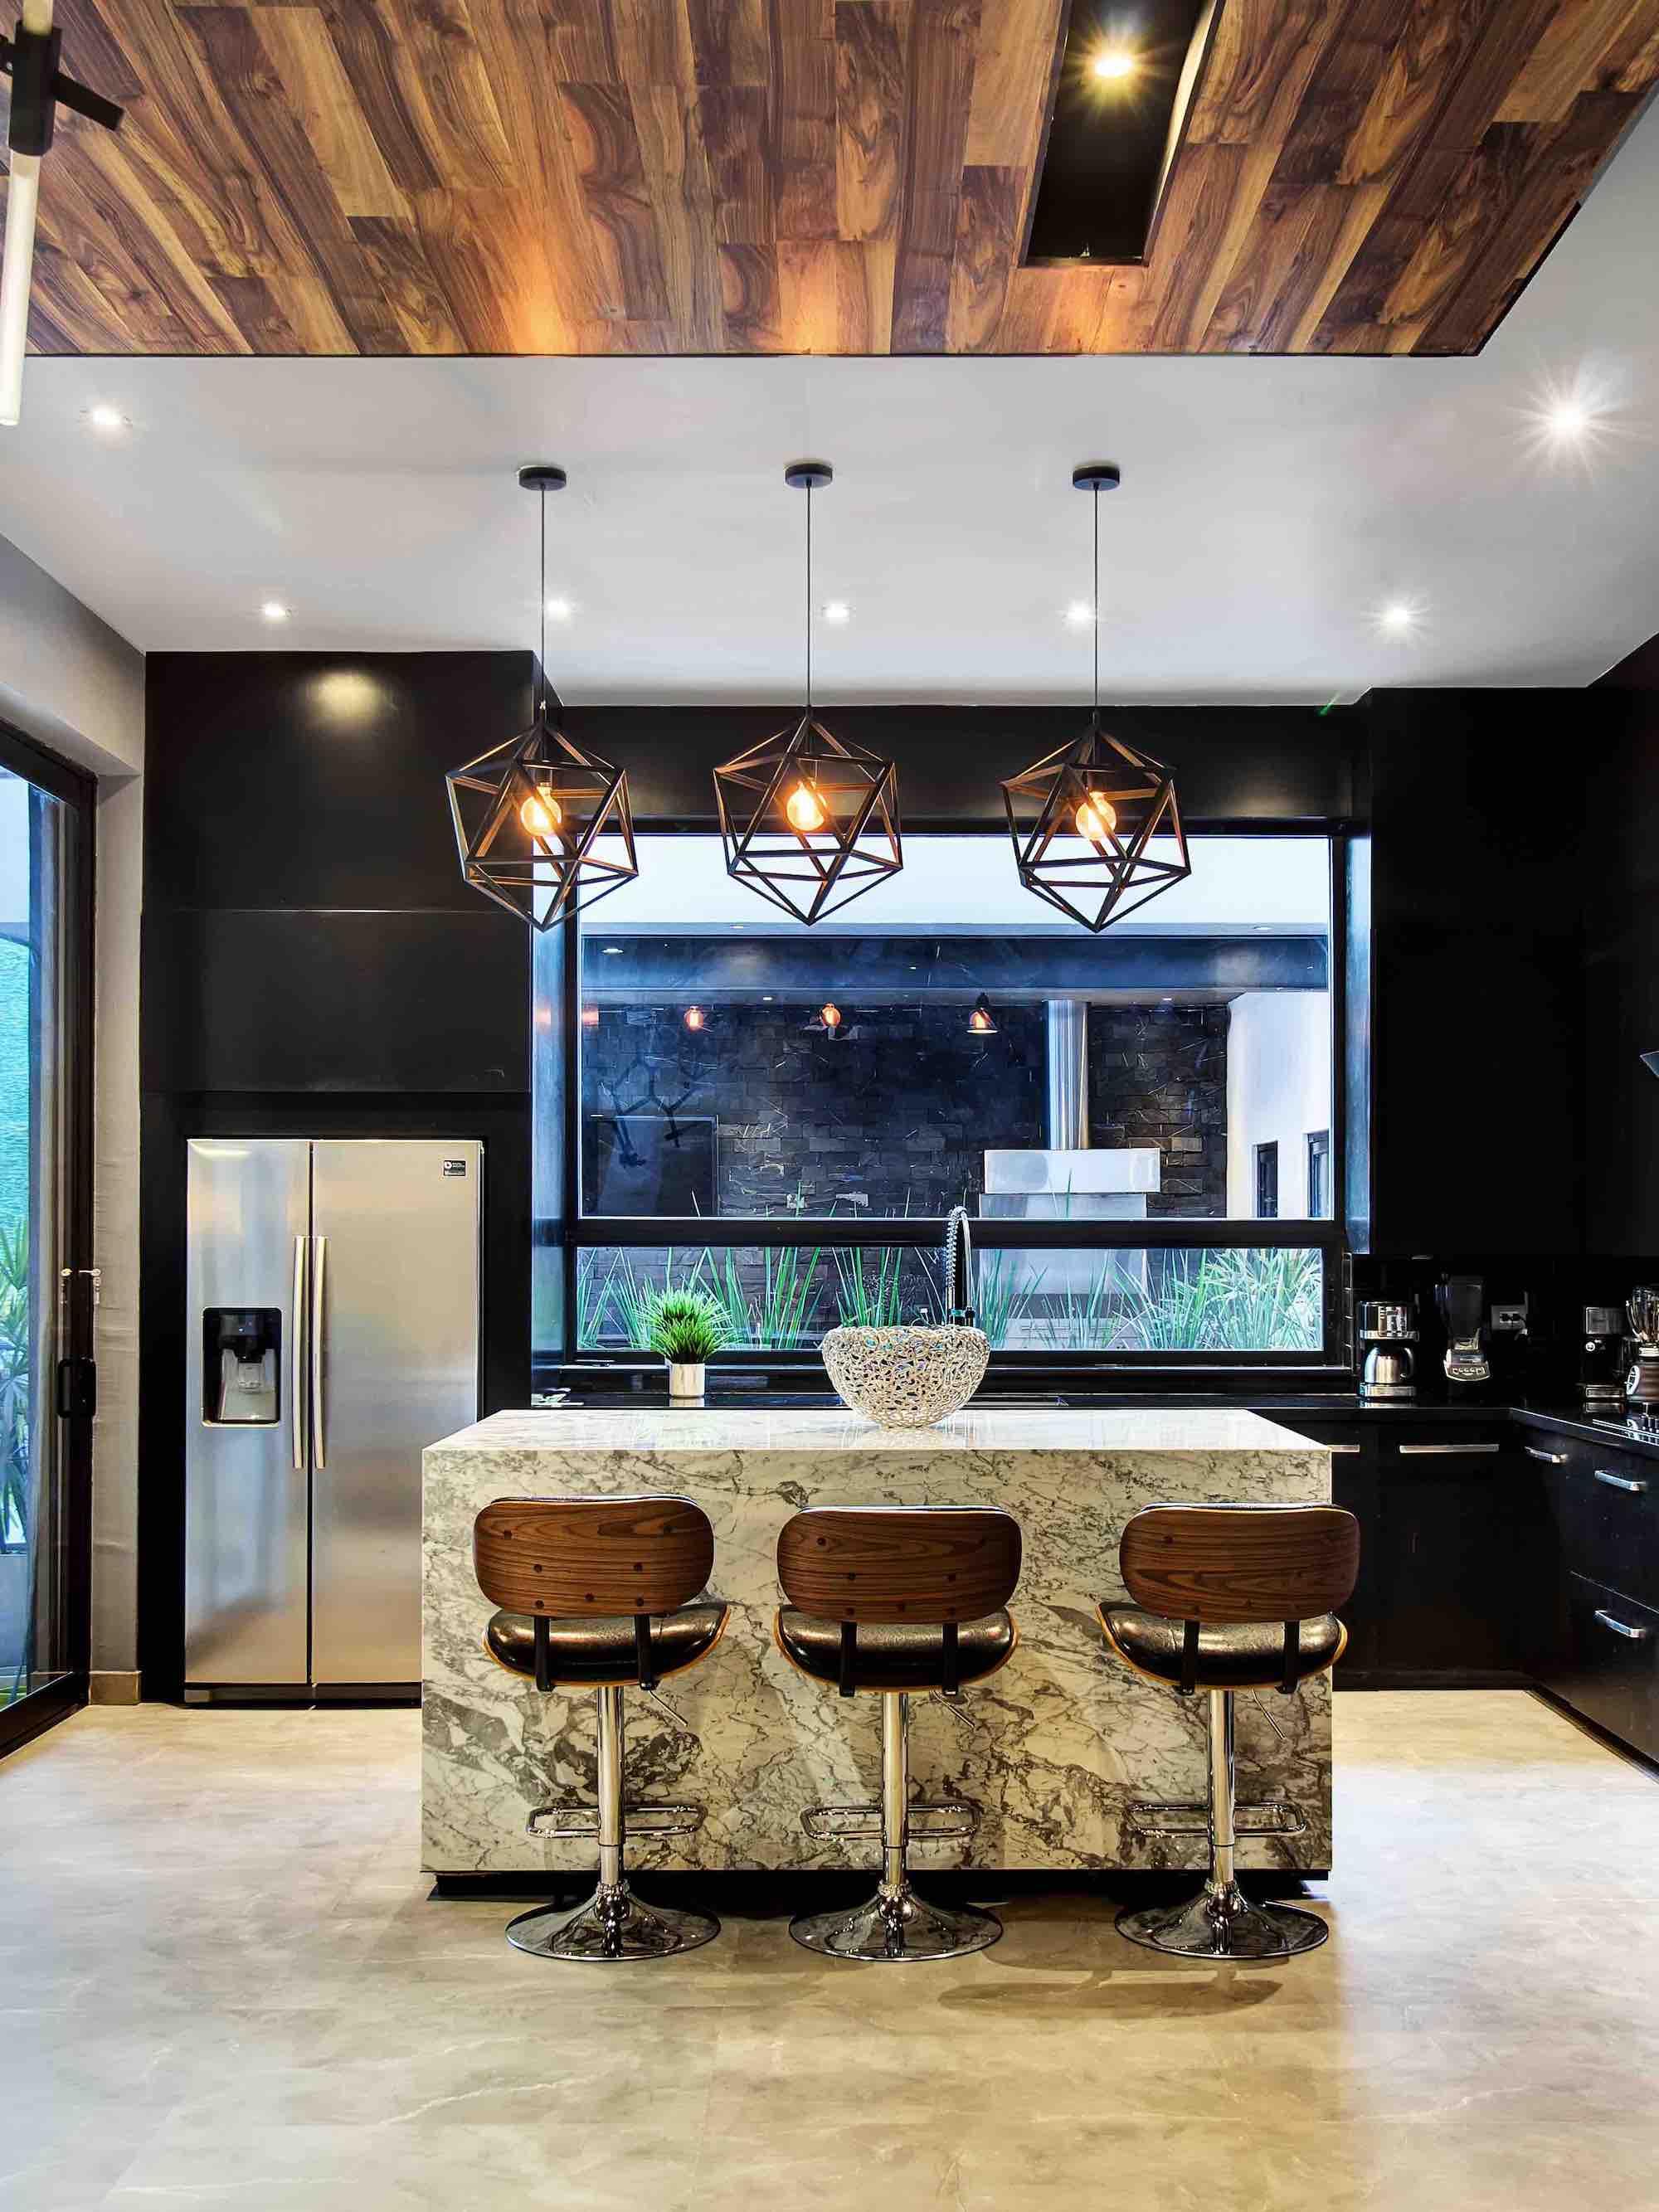 GR_House_Gallardo_arquitectura_amazingarchitecture_mexico_005.jpg